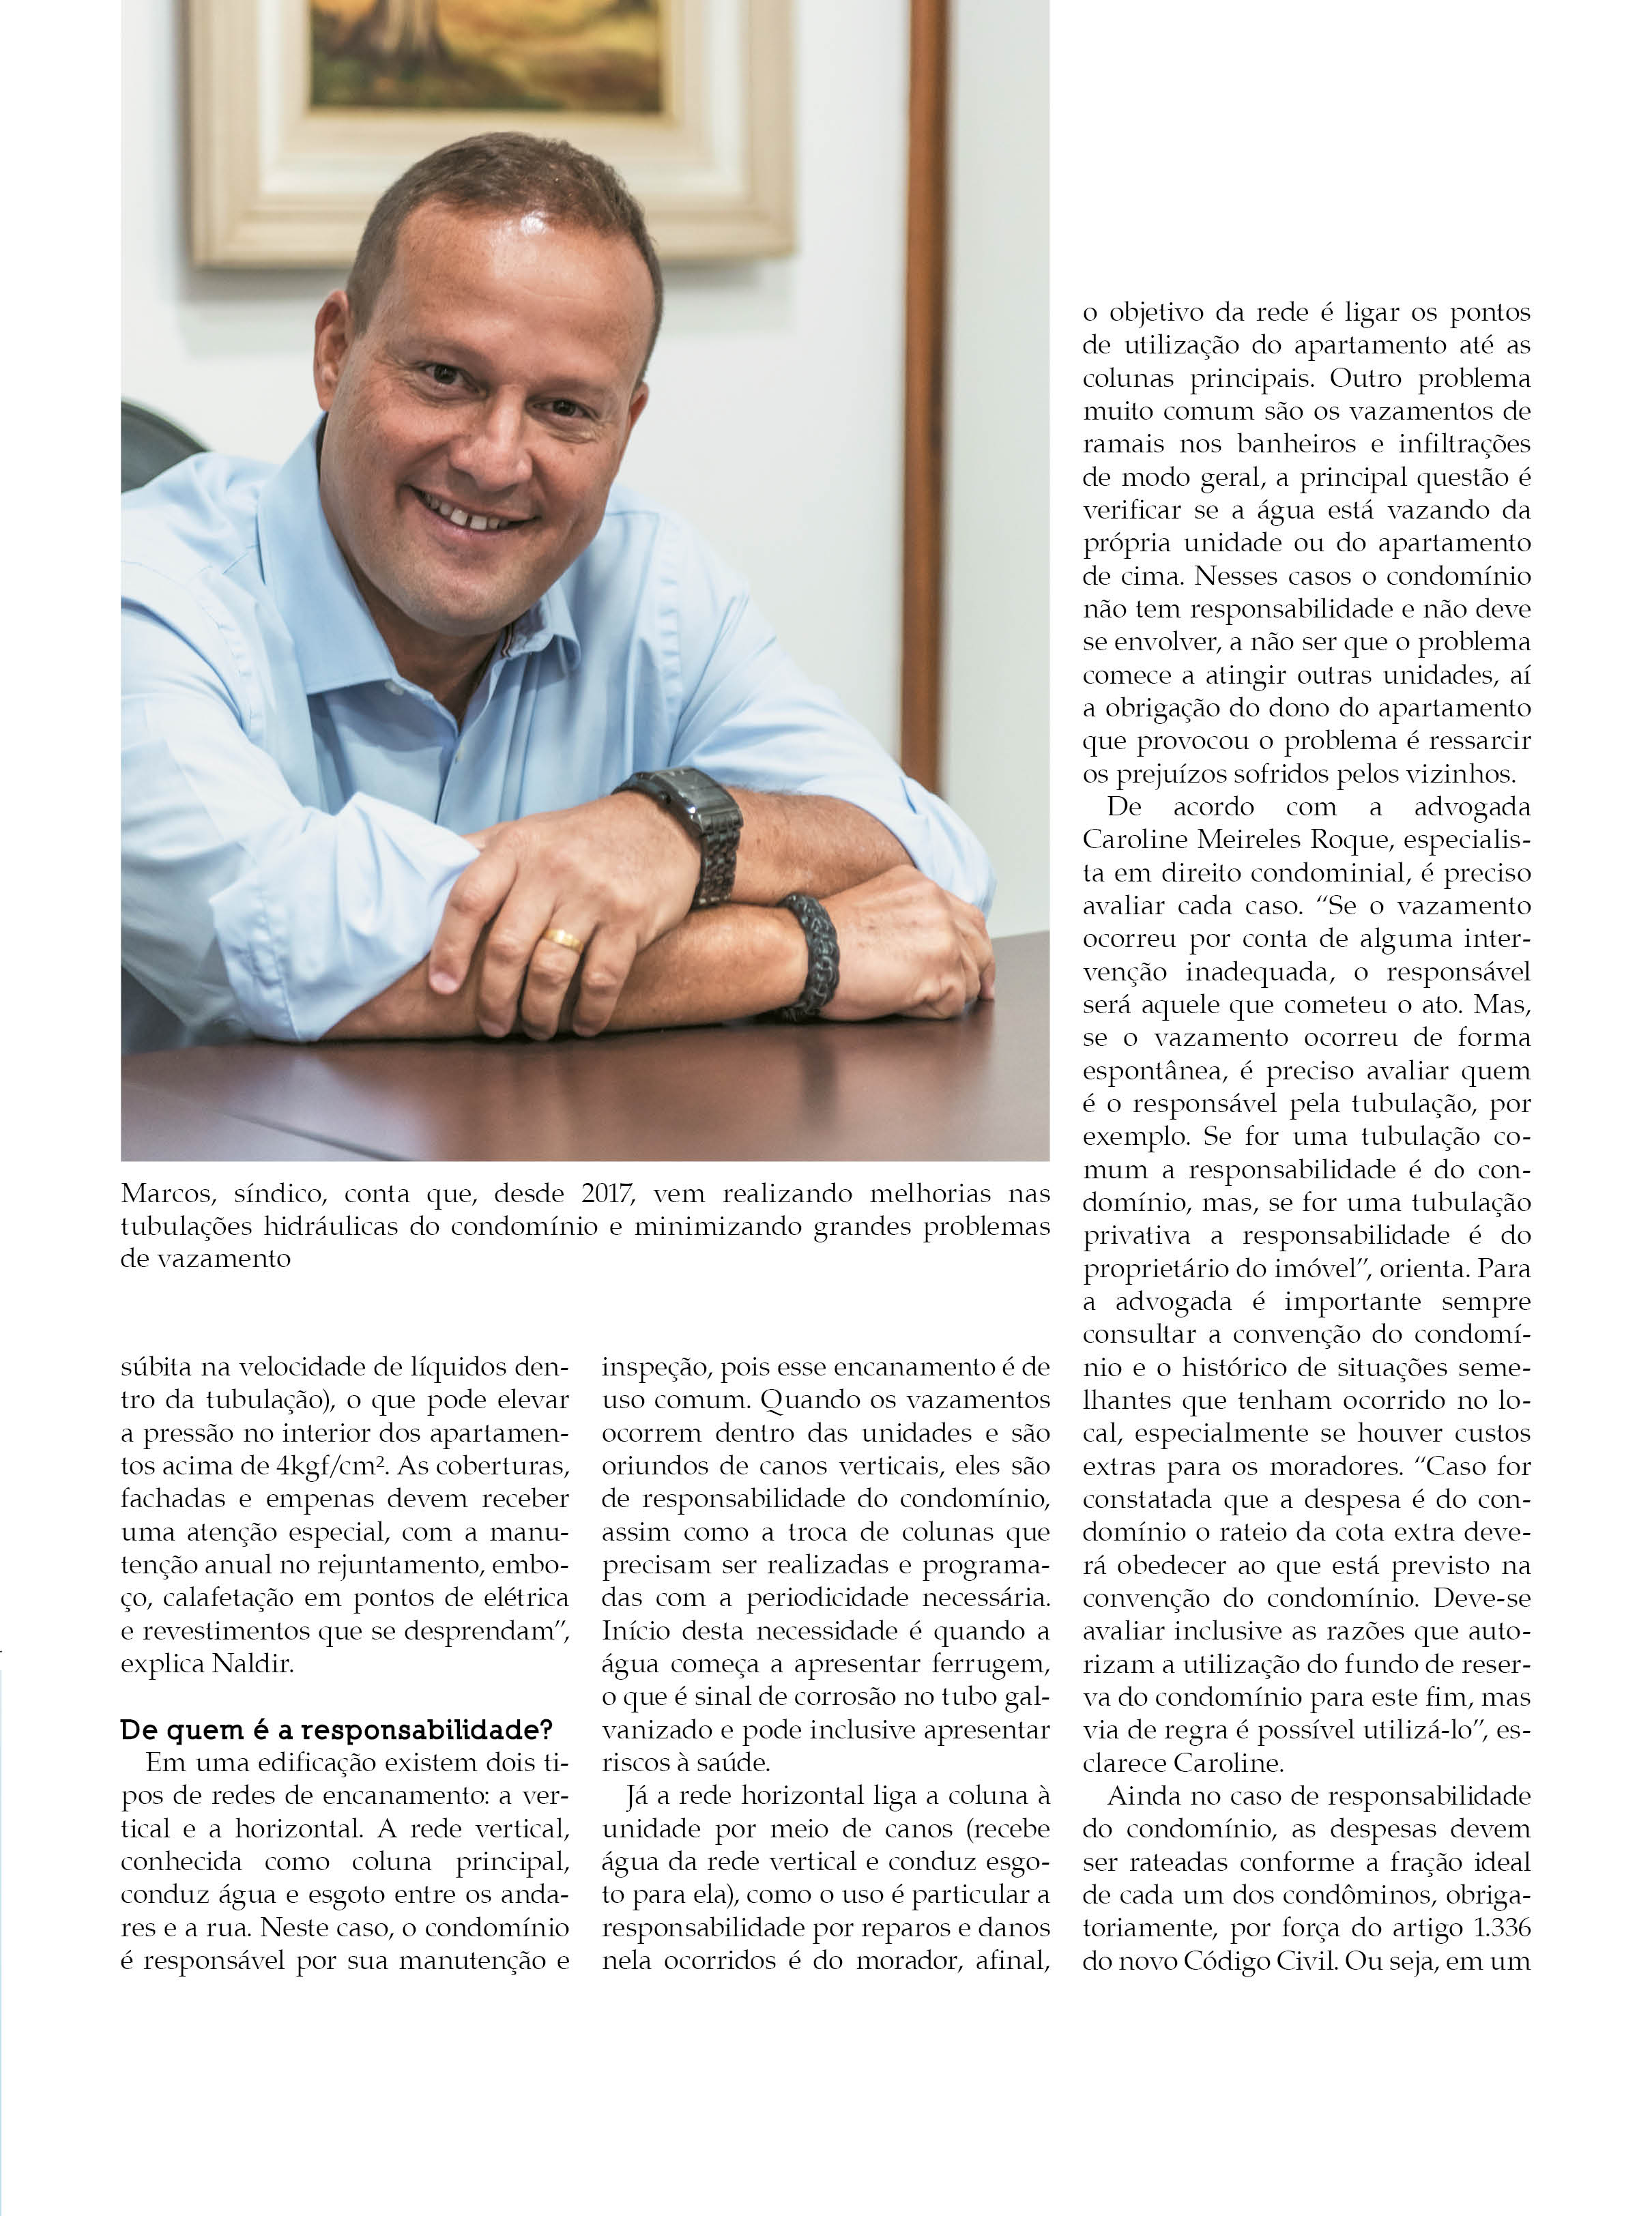 Revista Síndico_ed 246_45